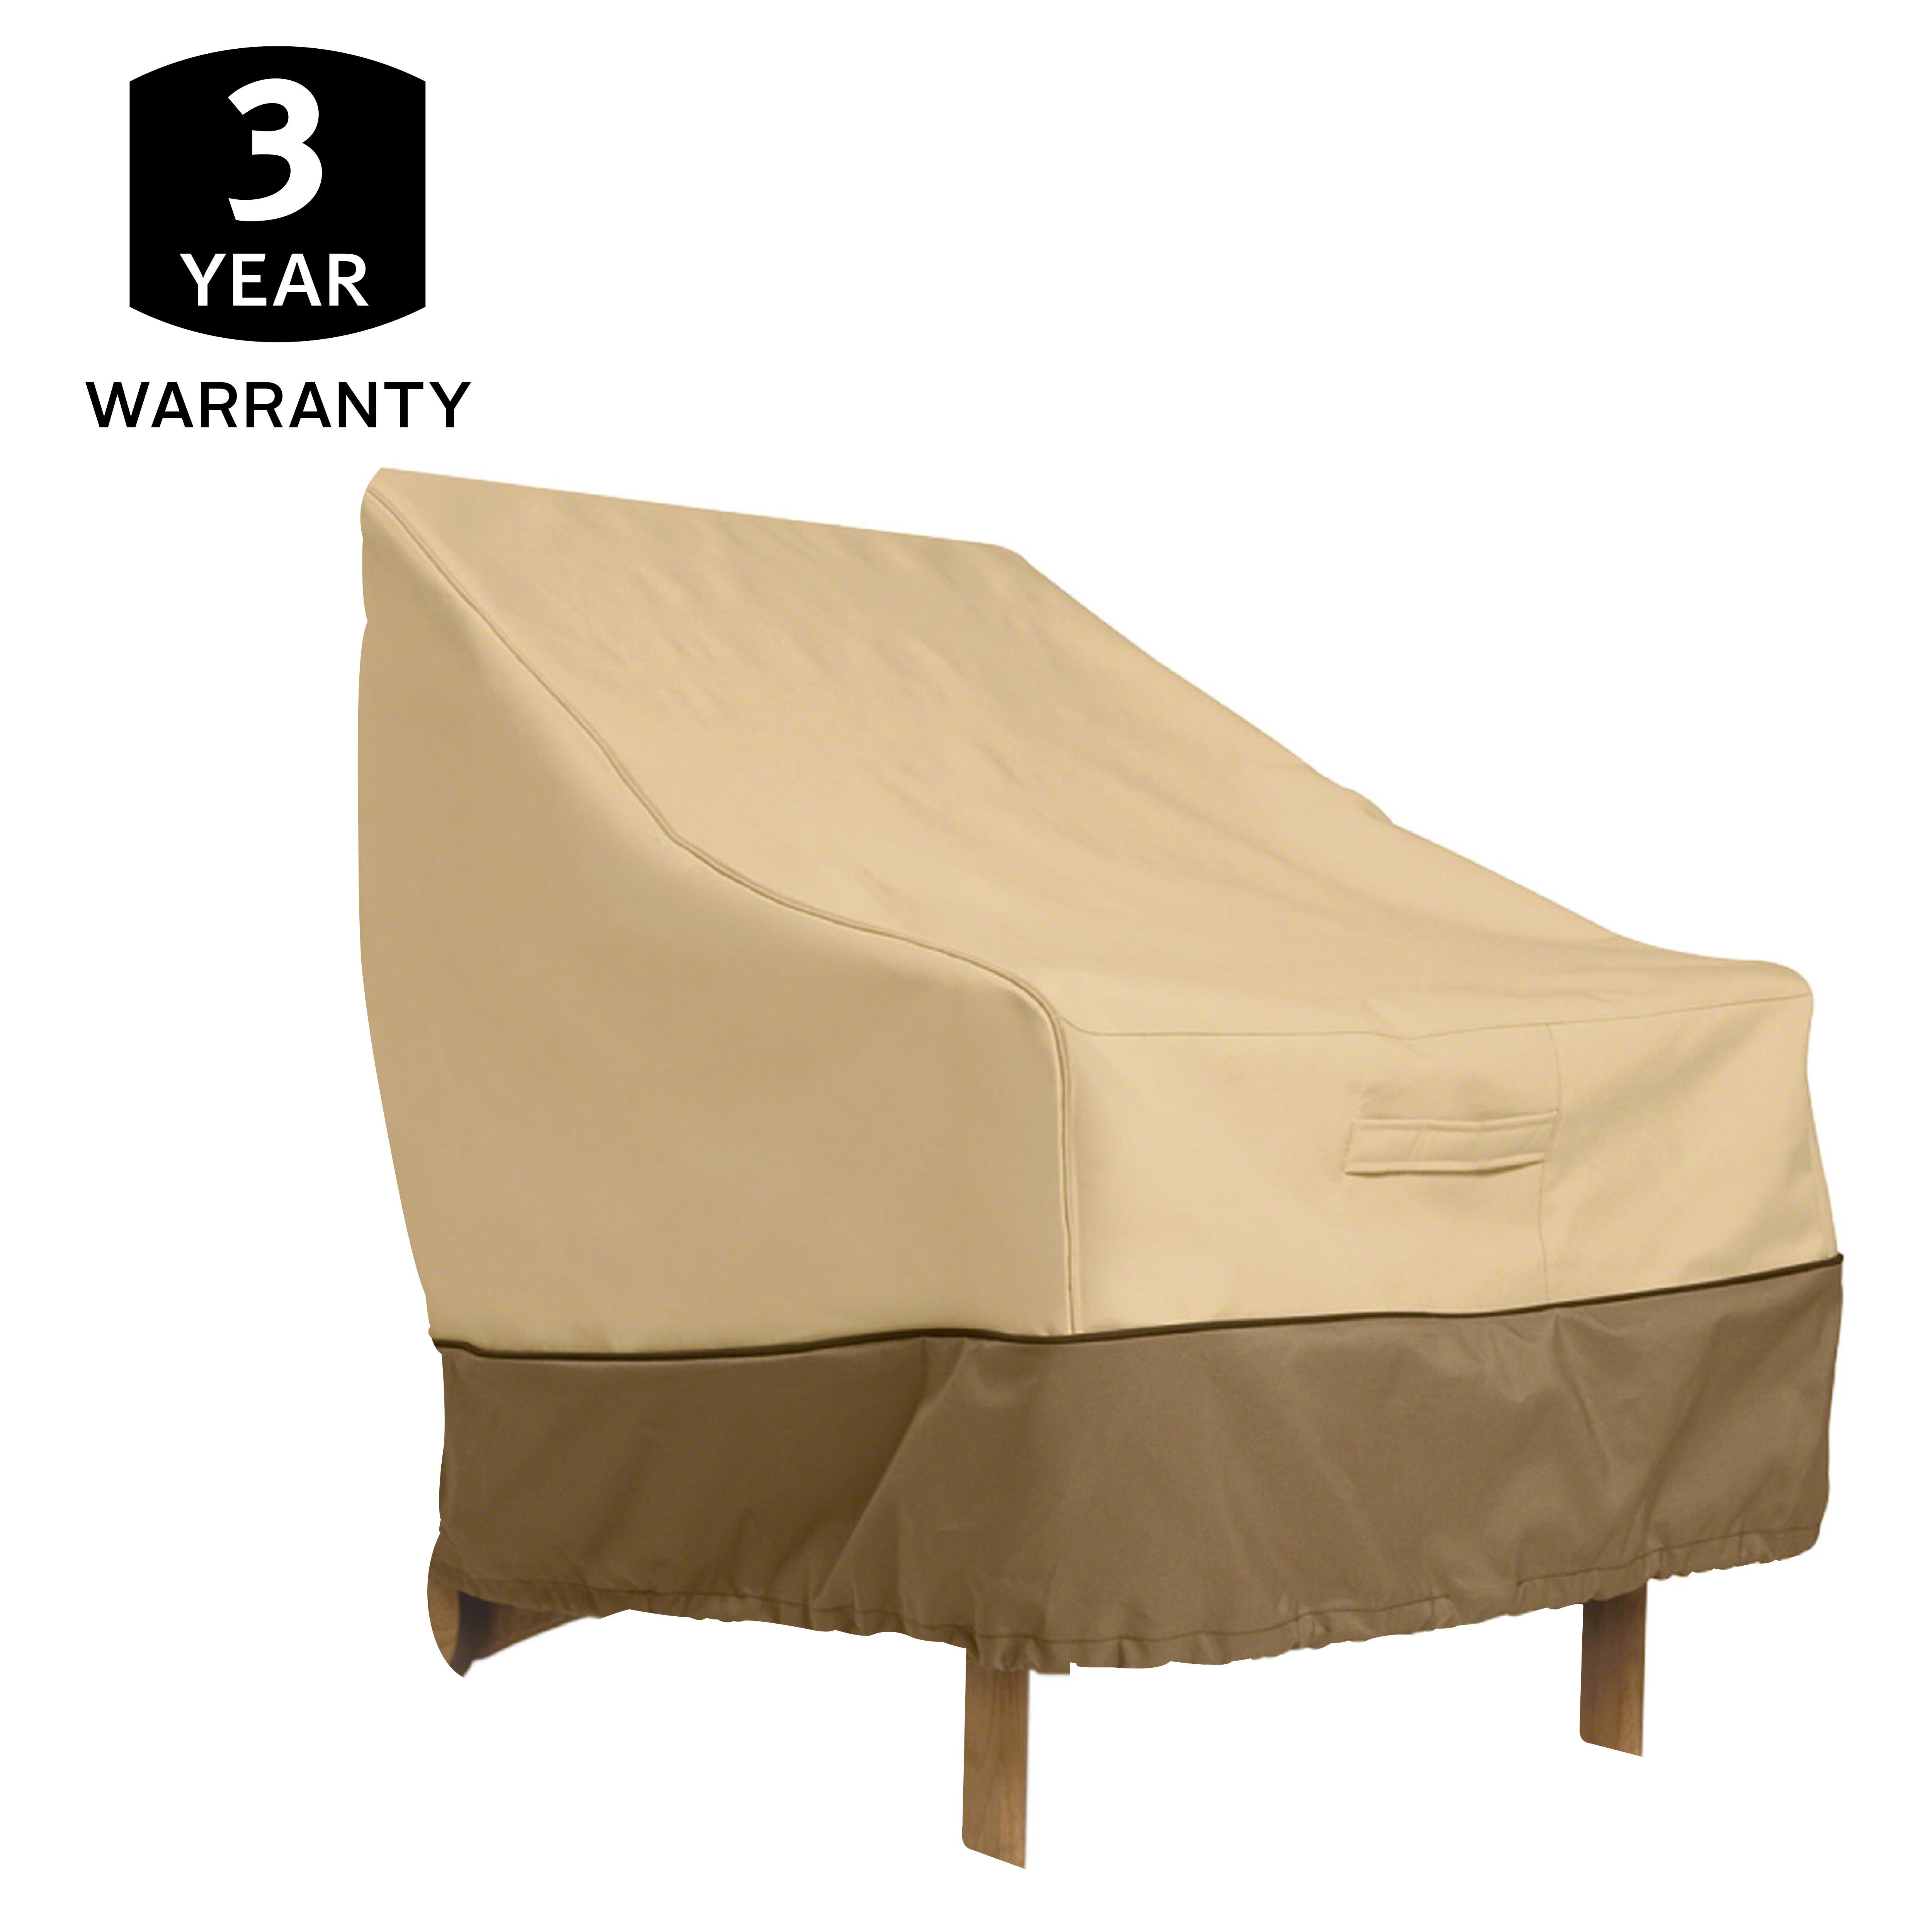 Classic Accessories Veranda Patio Chair Cover 78932 Size High B